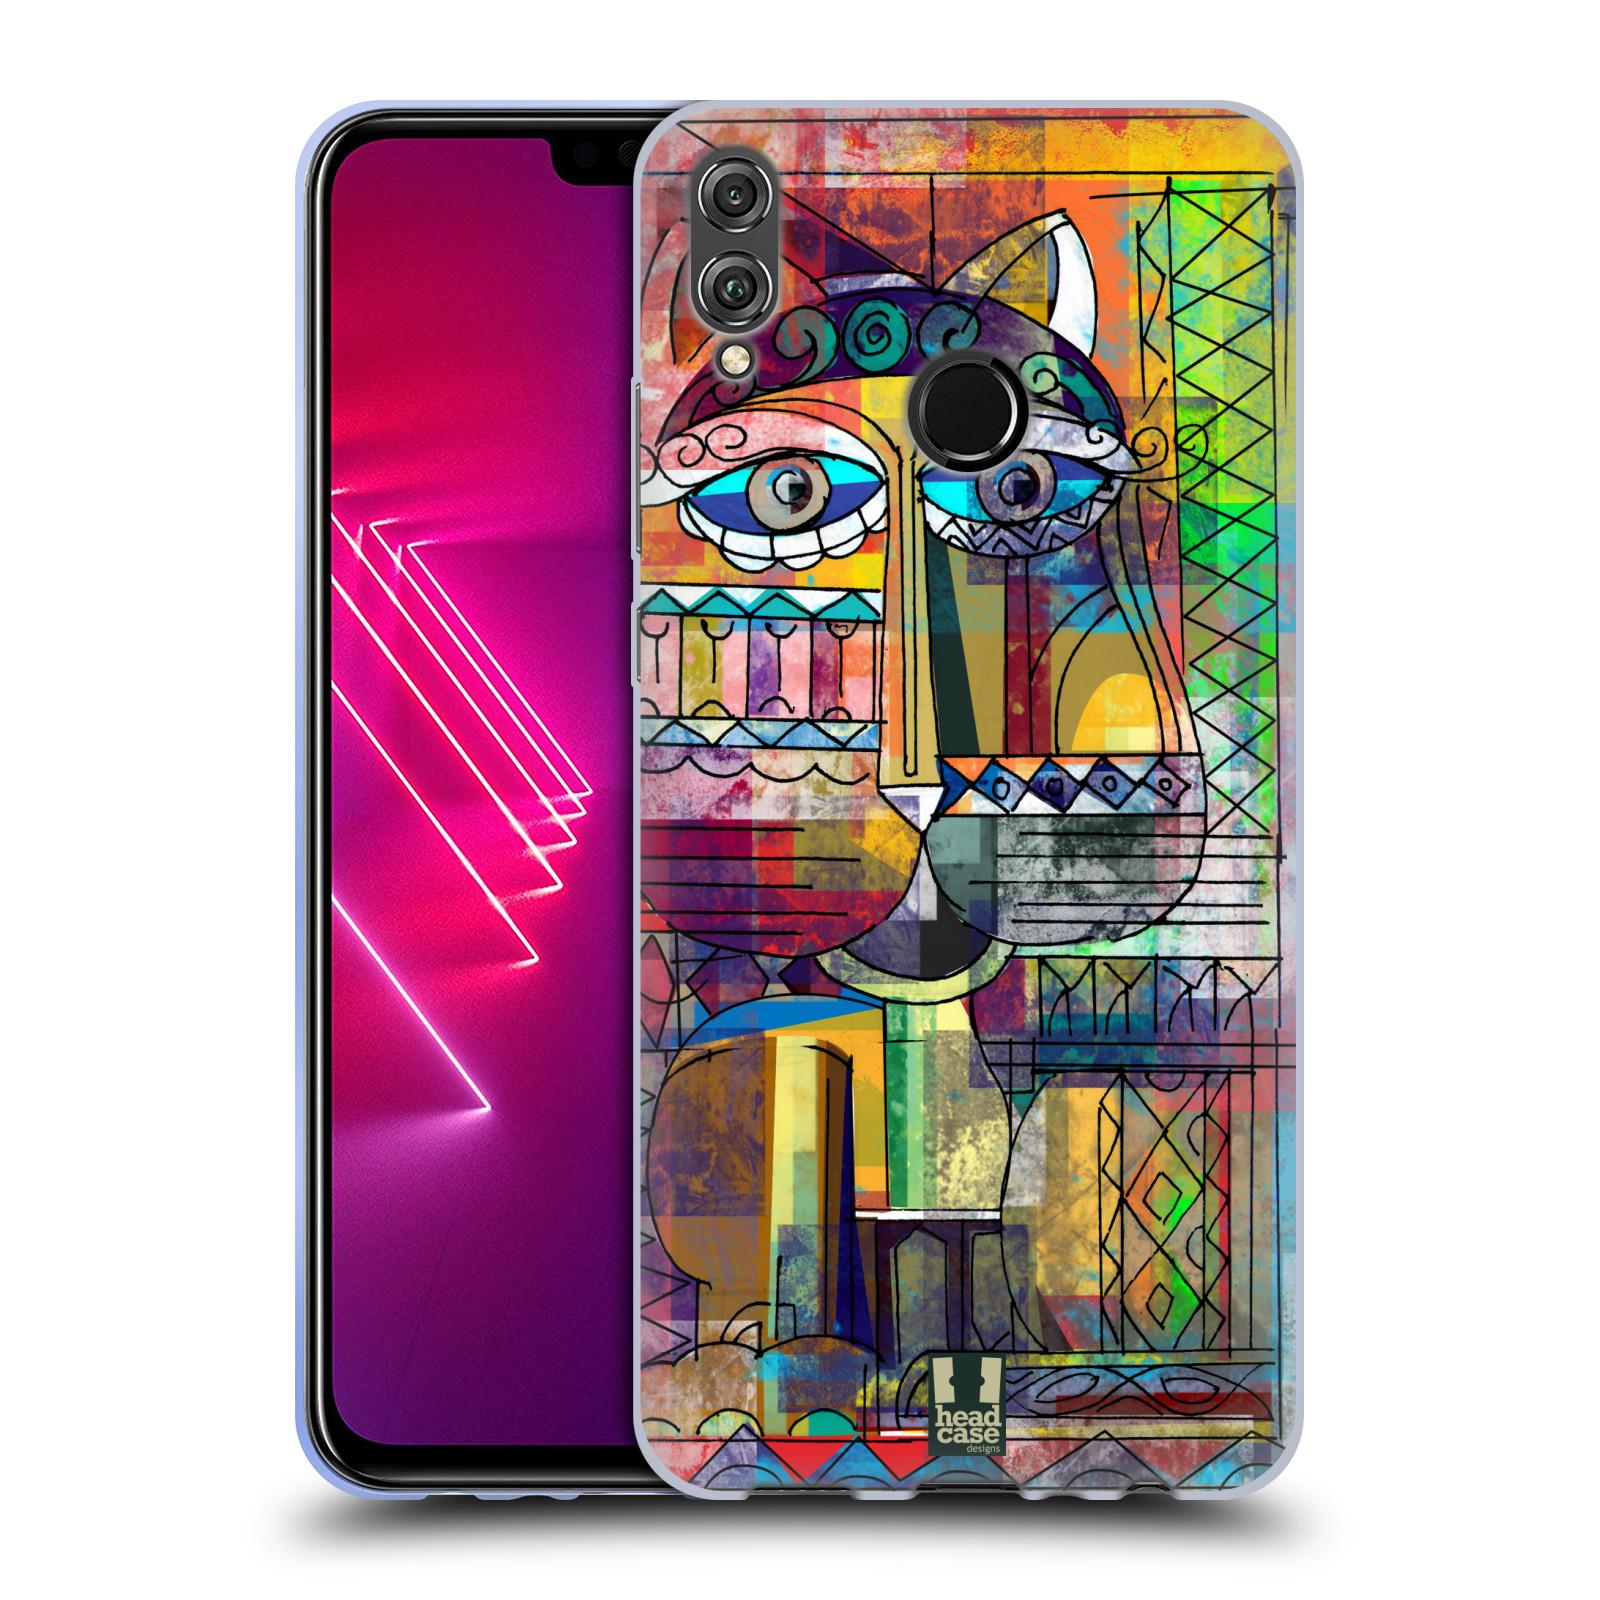 Silikonové pouzdro na mobil Honor View 10 Lite - Head Case - AZTEC KORAT